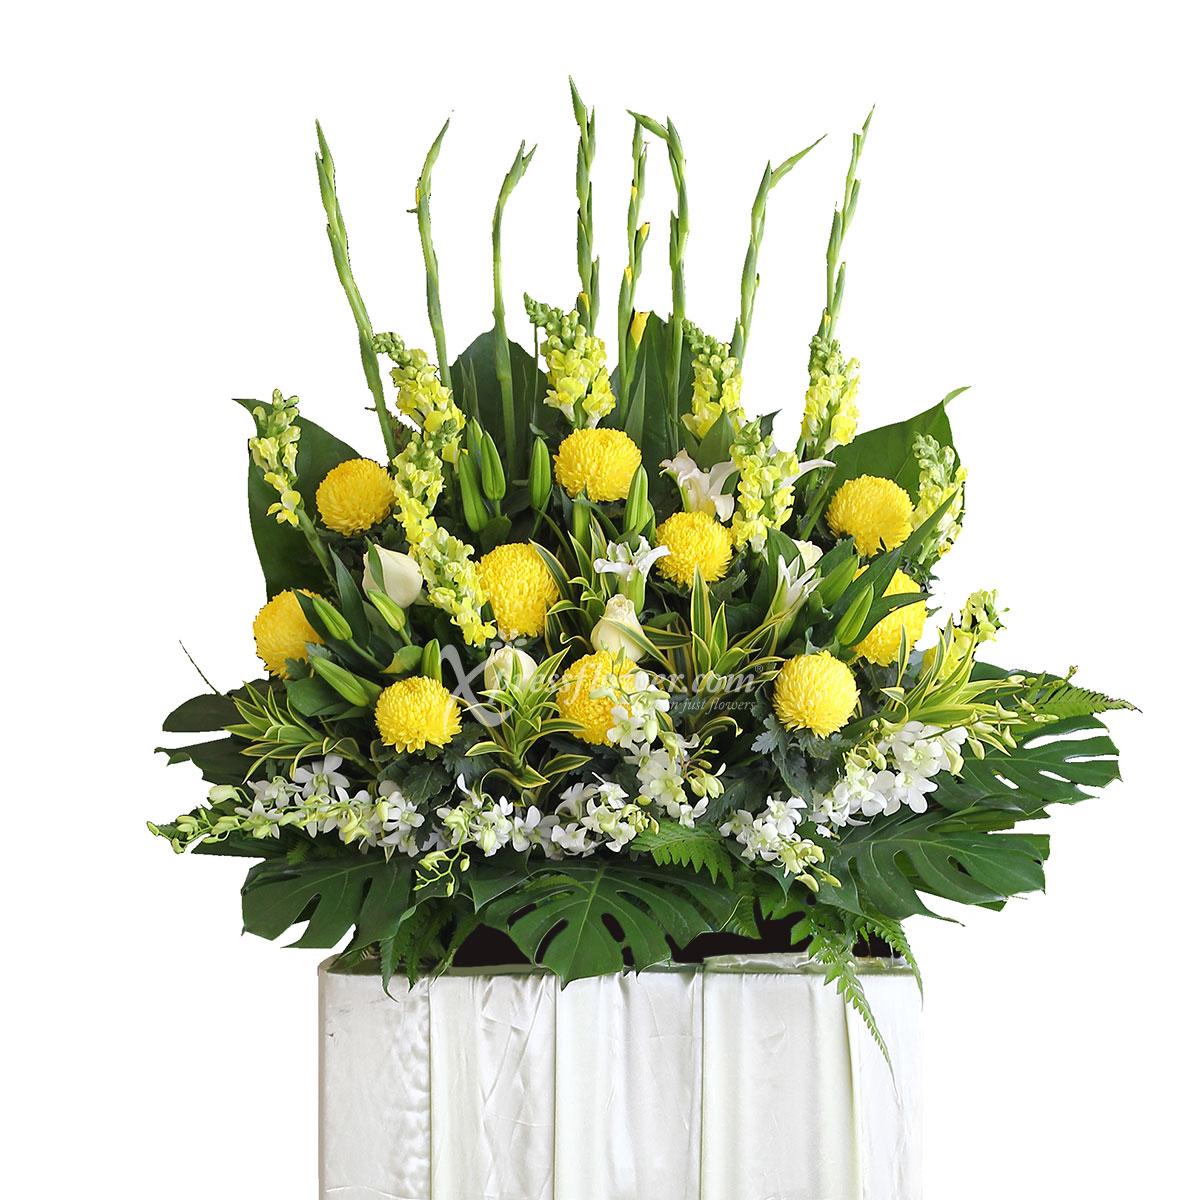 Heartfelt Prayers (Wreath)